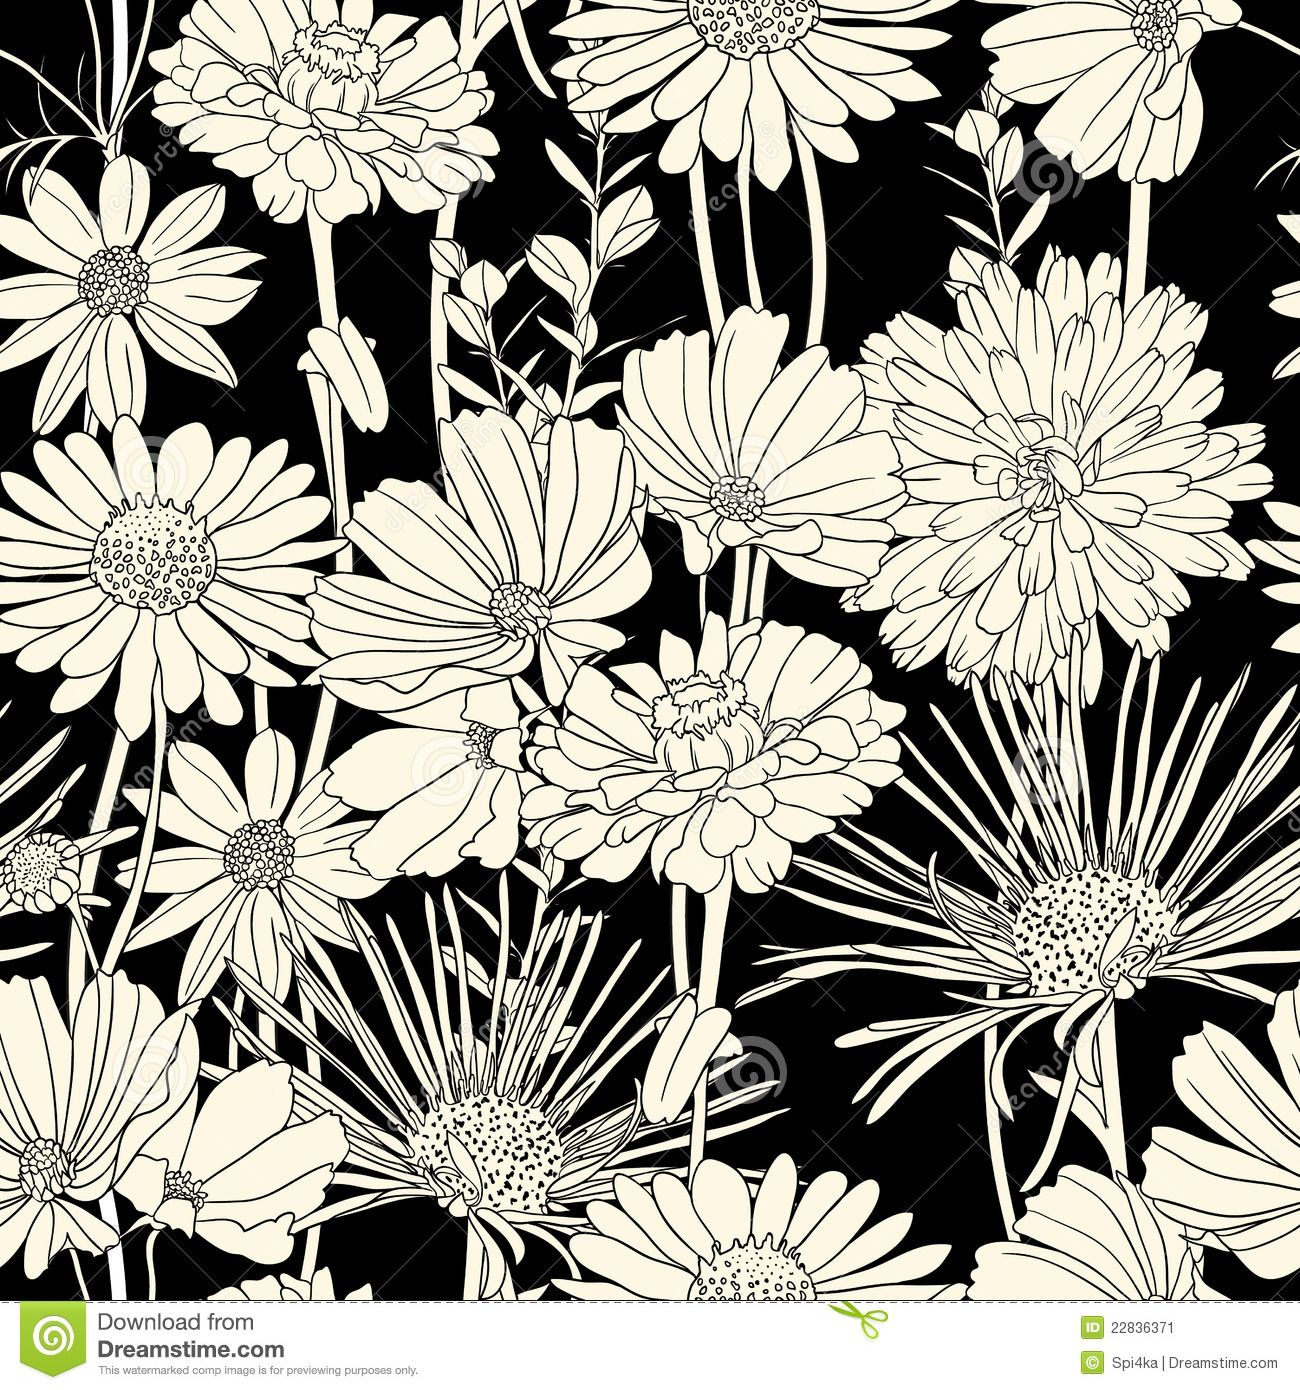 black-white-floral-seamless-pattern-22836371.jpg (1300×1390)